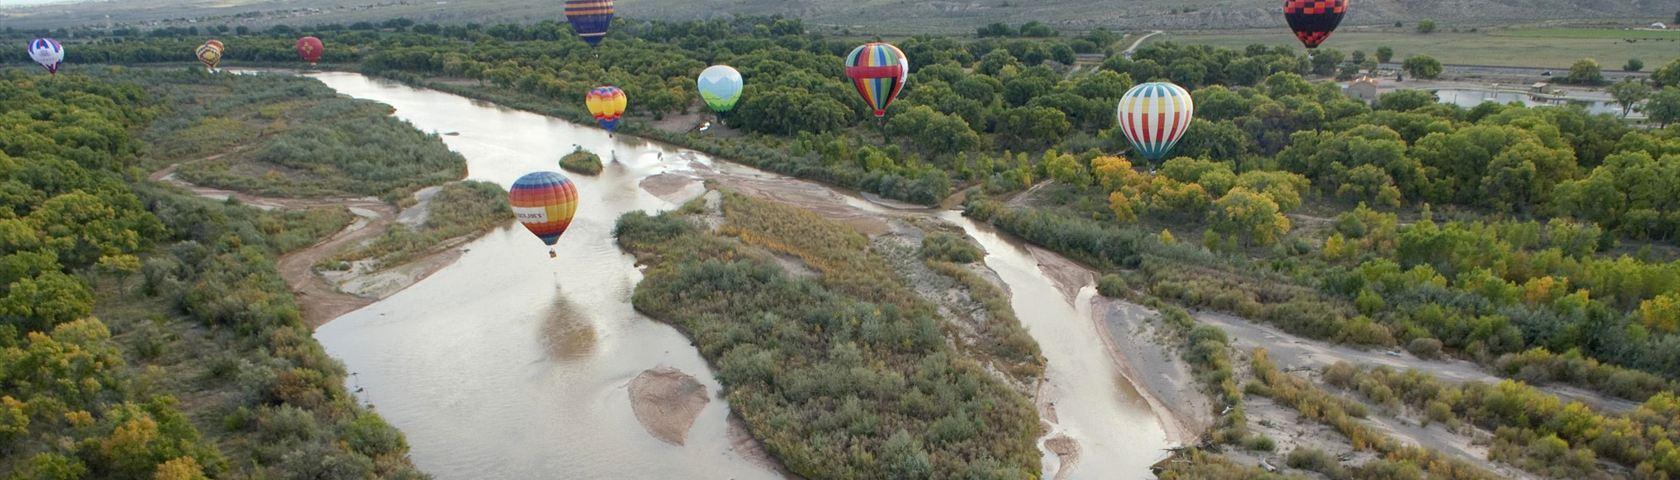 Hot Air Balloons #3